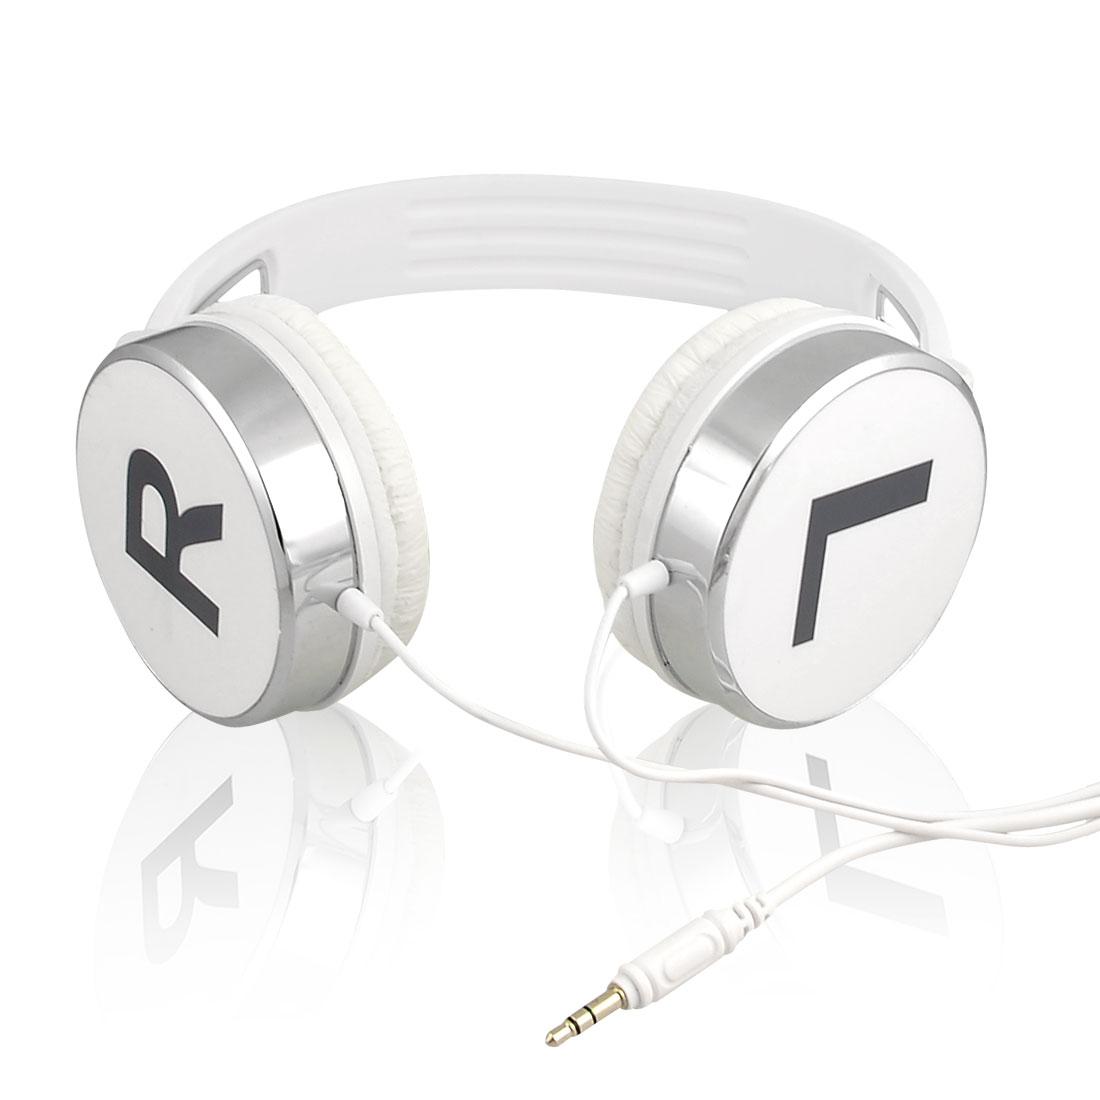 KM870 3.5mm Headset Headphones Earphones w Mic White for MP4 MP5 PC